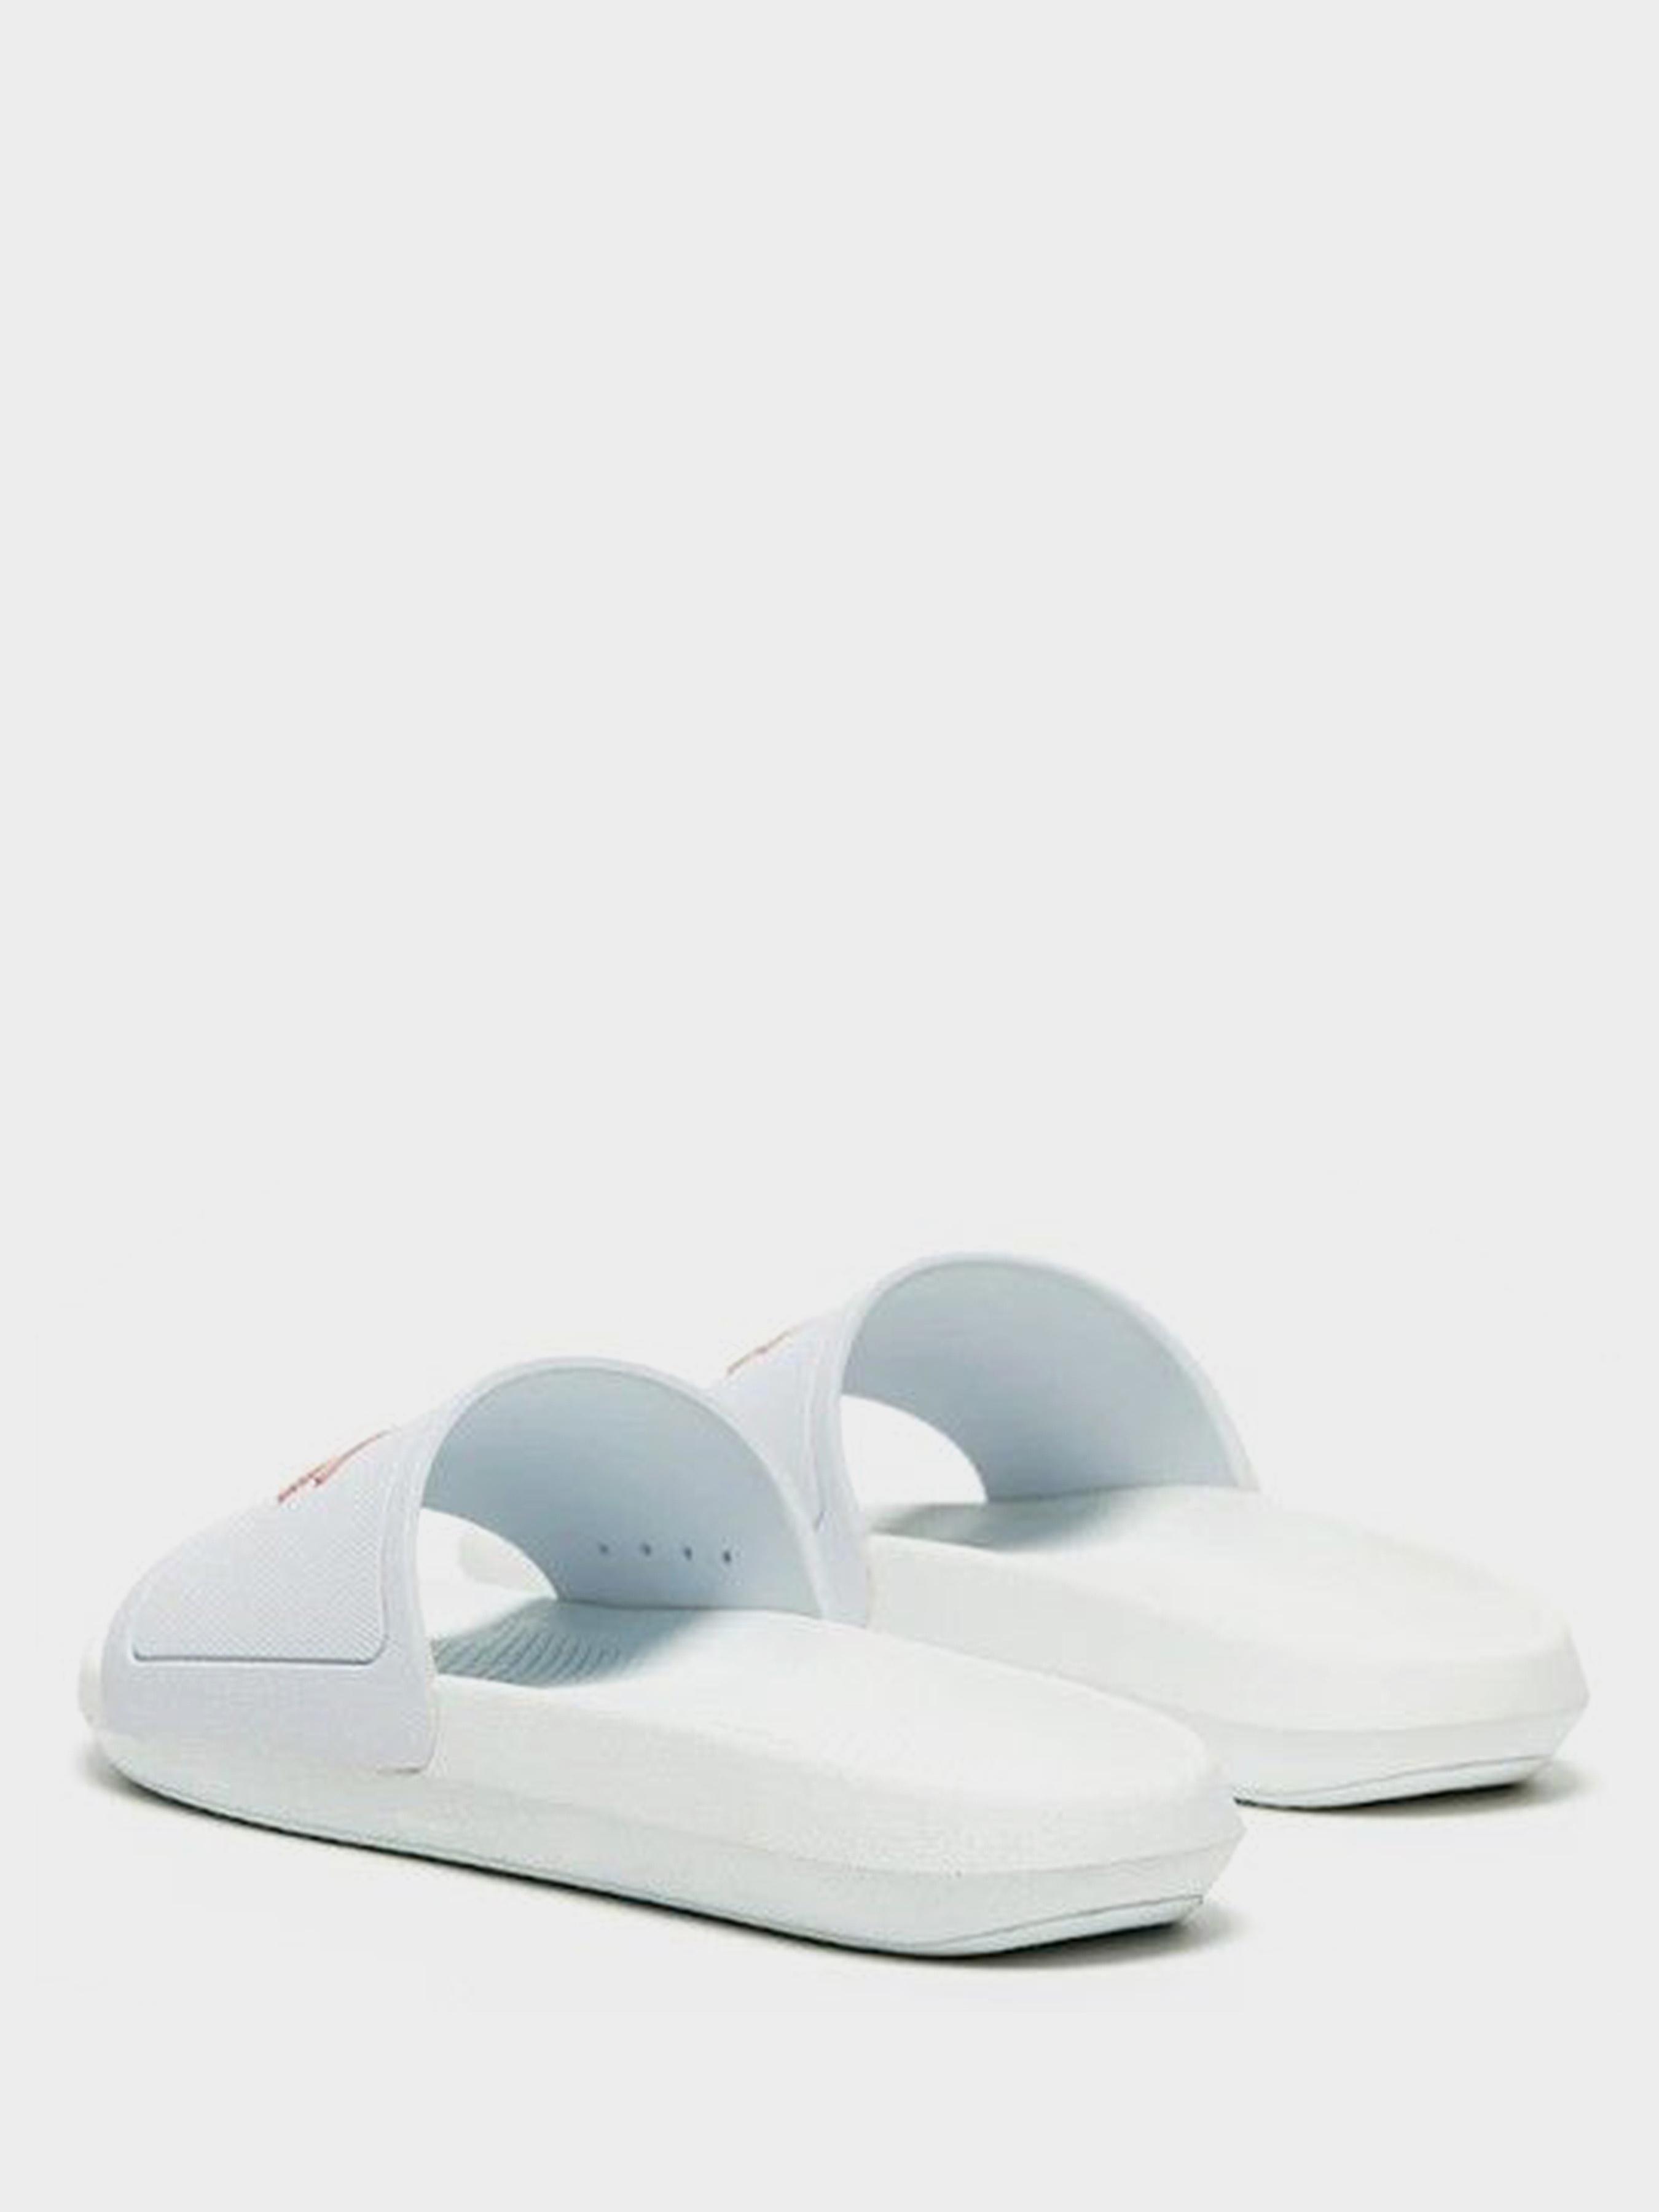 Шлёпанцы для женщин Lacoste LL188 размеры обуви, 2017